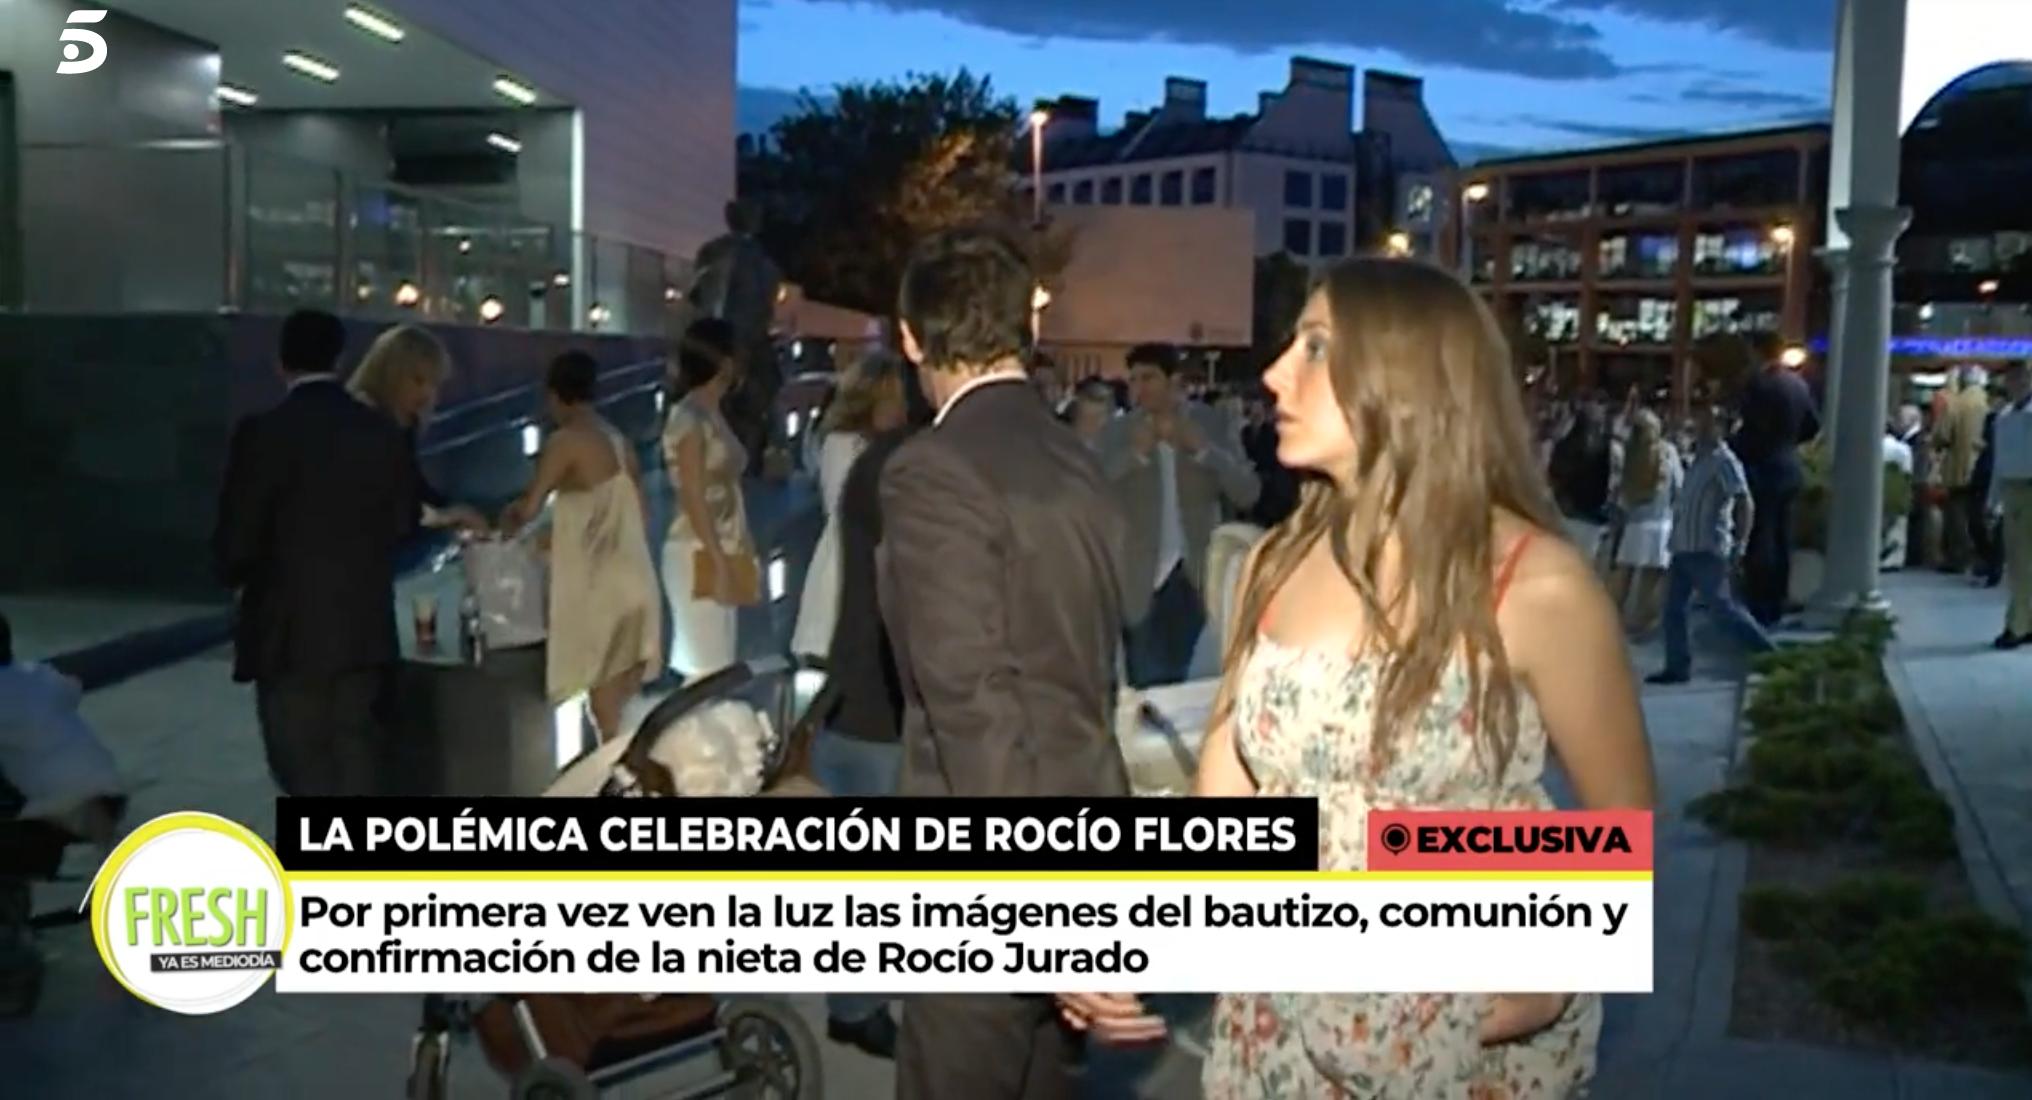 Antonio David Flores i Rocío Flores el dia de la comunitat d'ella | Telecinco